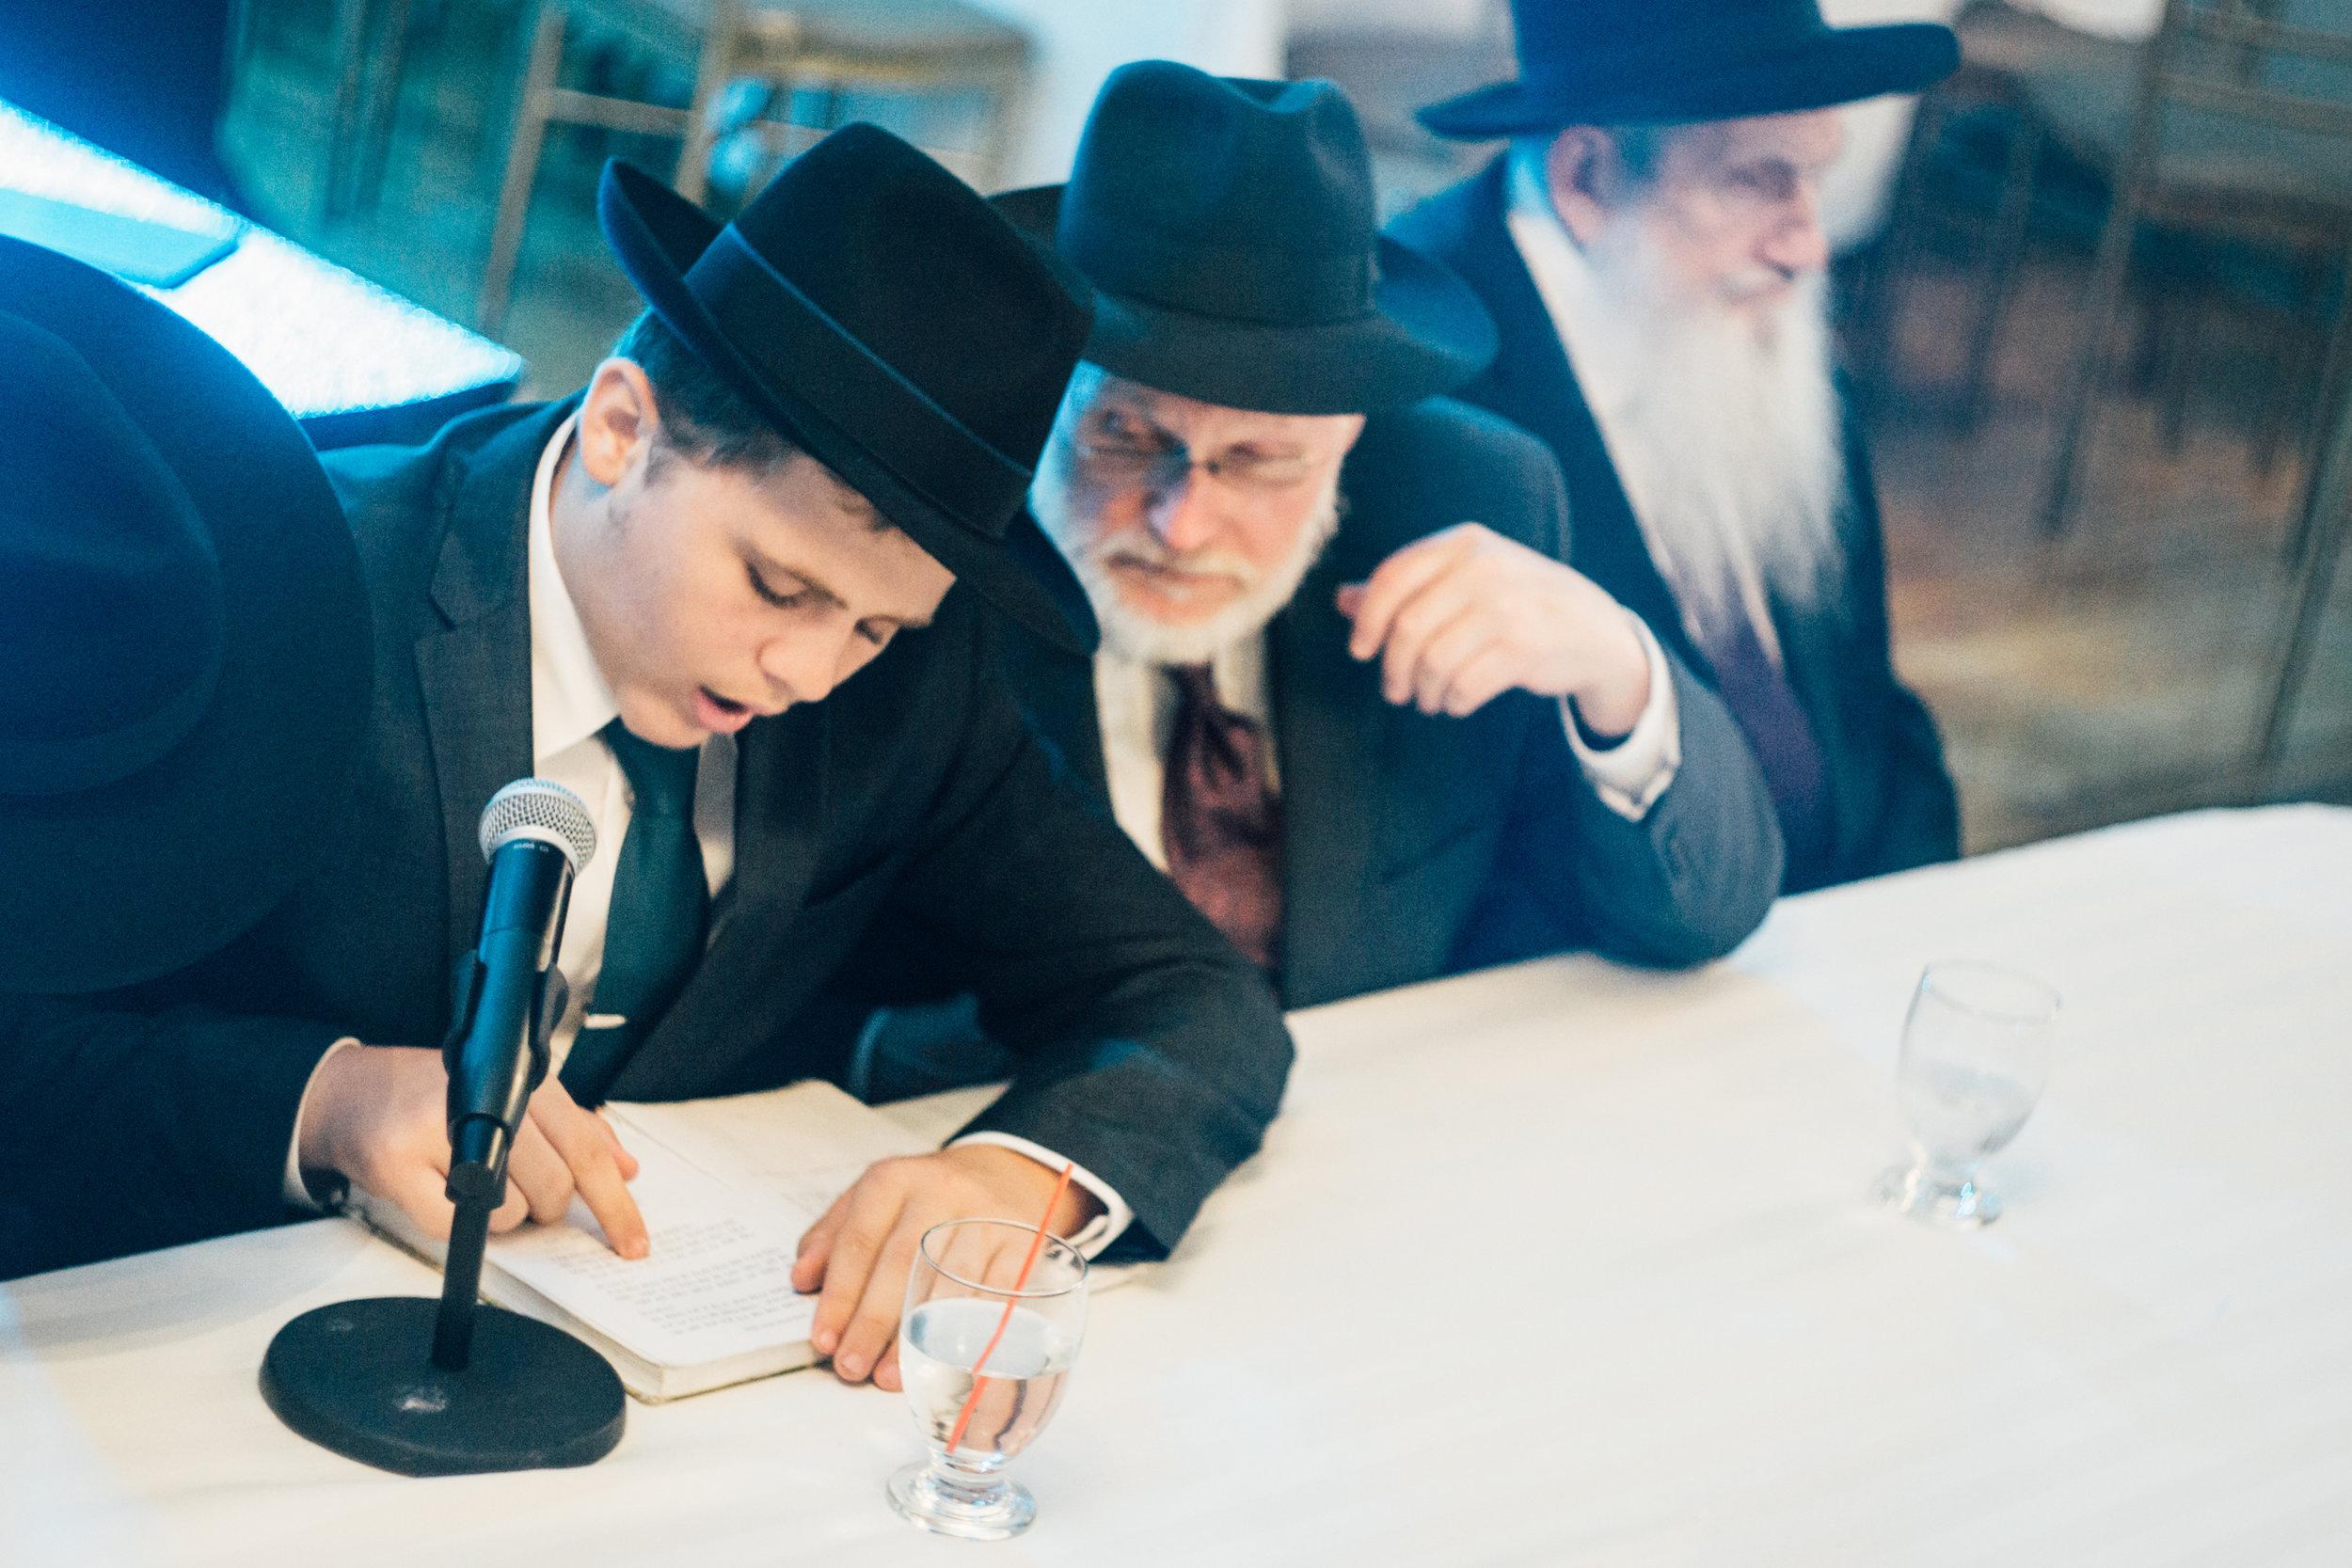 Bar Mitzvah Meir Sandman - photography, new york, events, people -0344.jpg